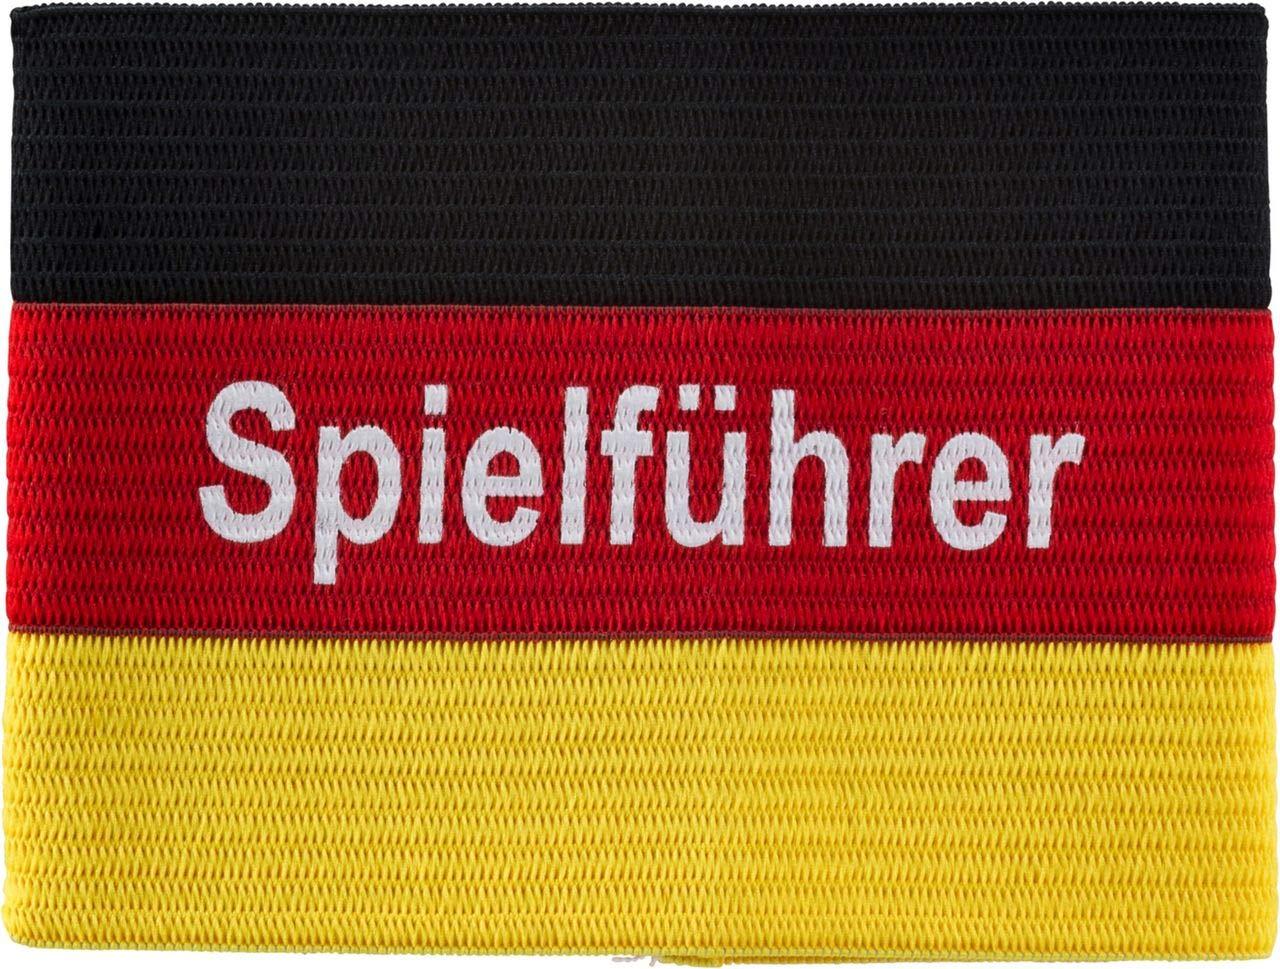 PRO TOUCH Armbinde Spielführer Germany